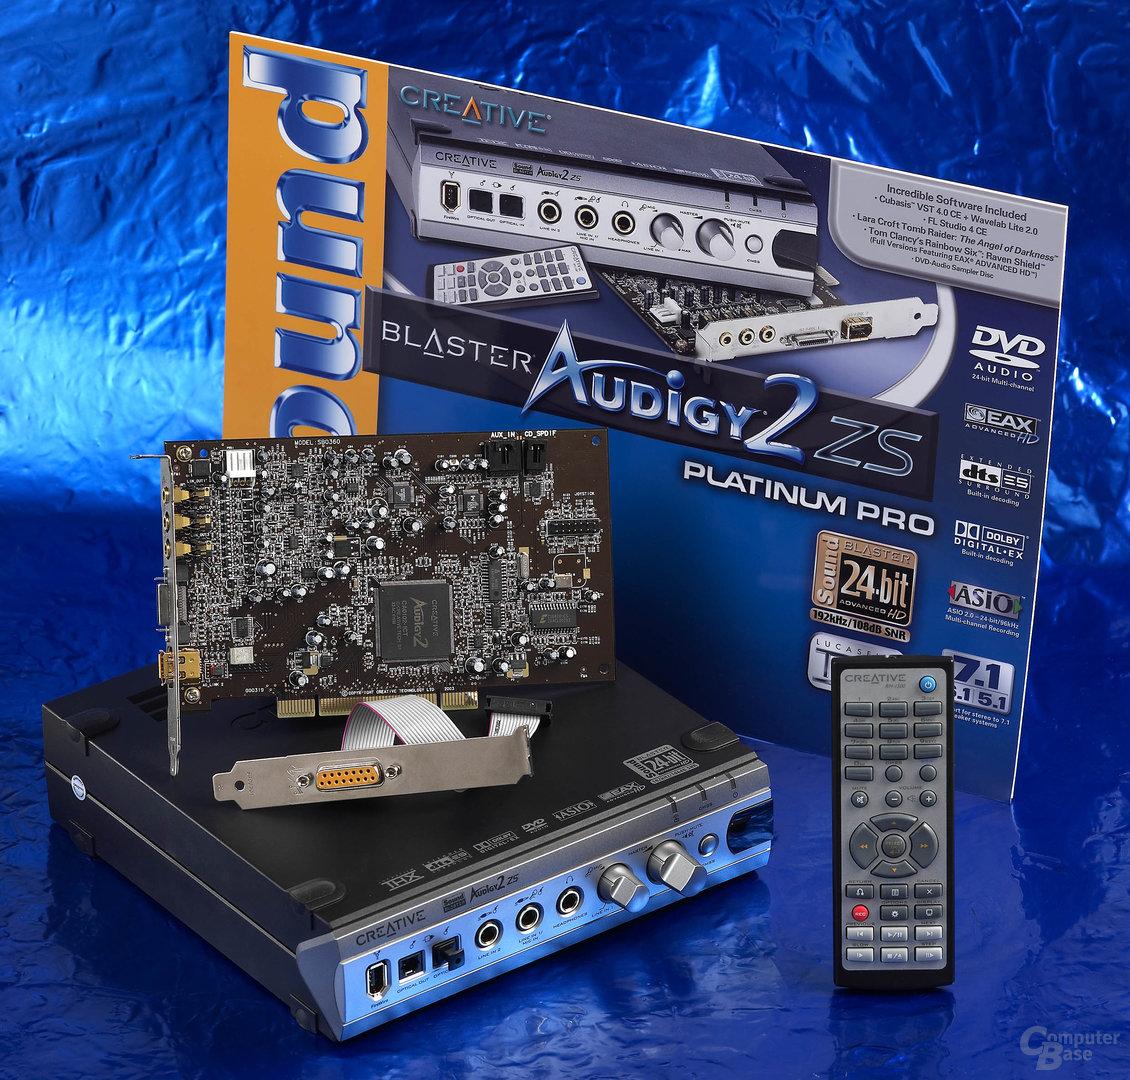 Audigy2 ZS Pro Platinum